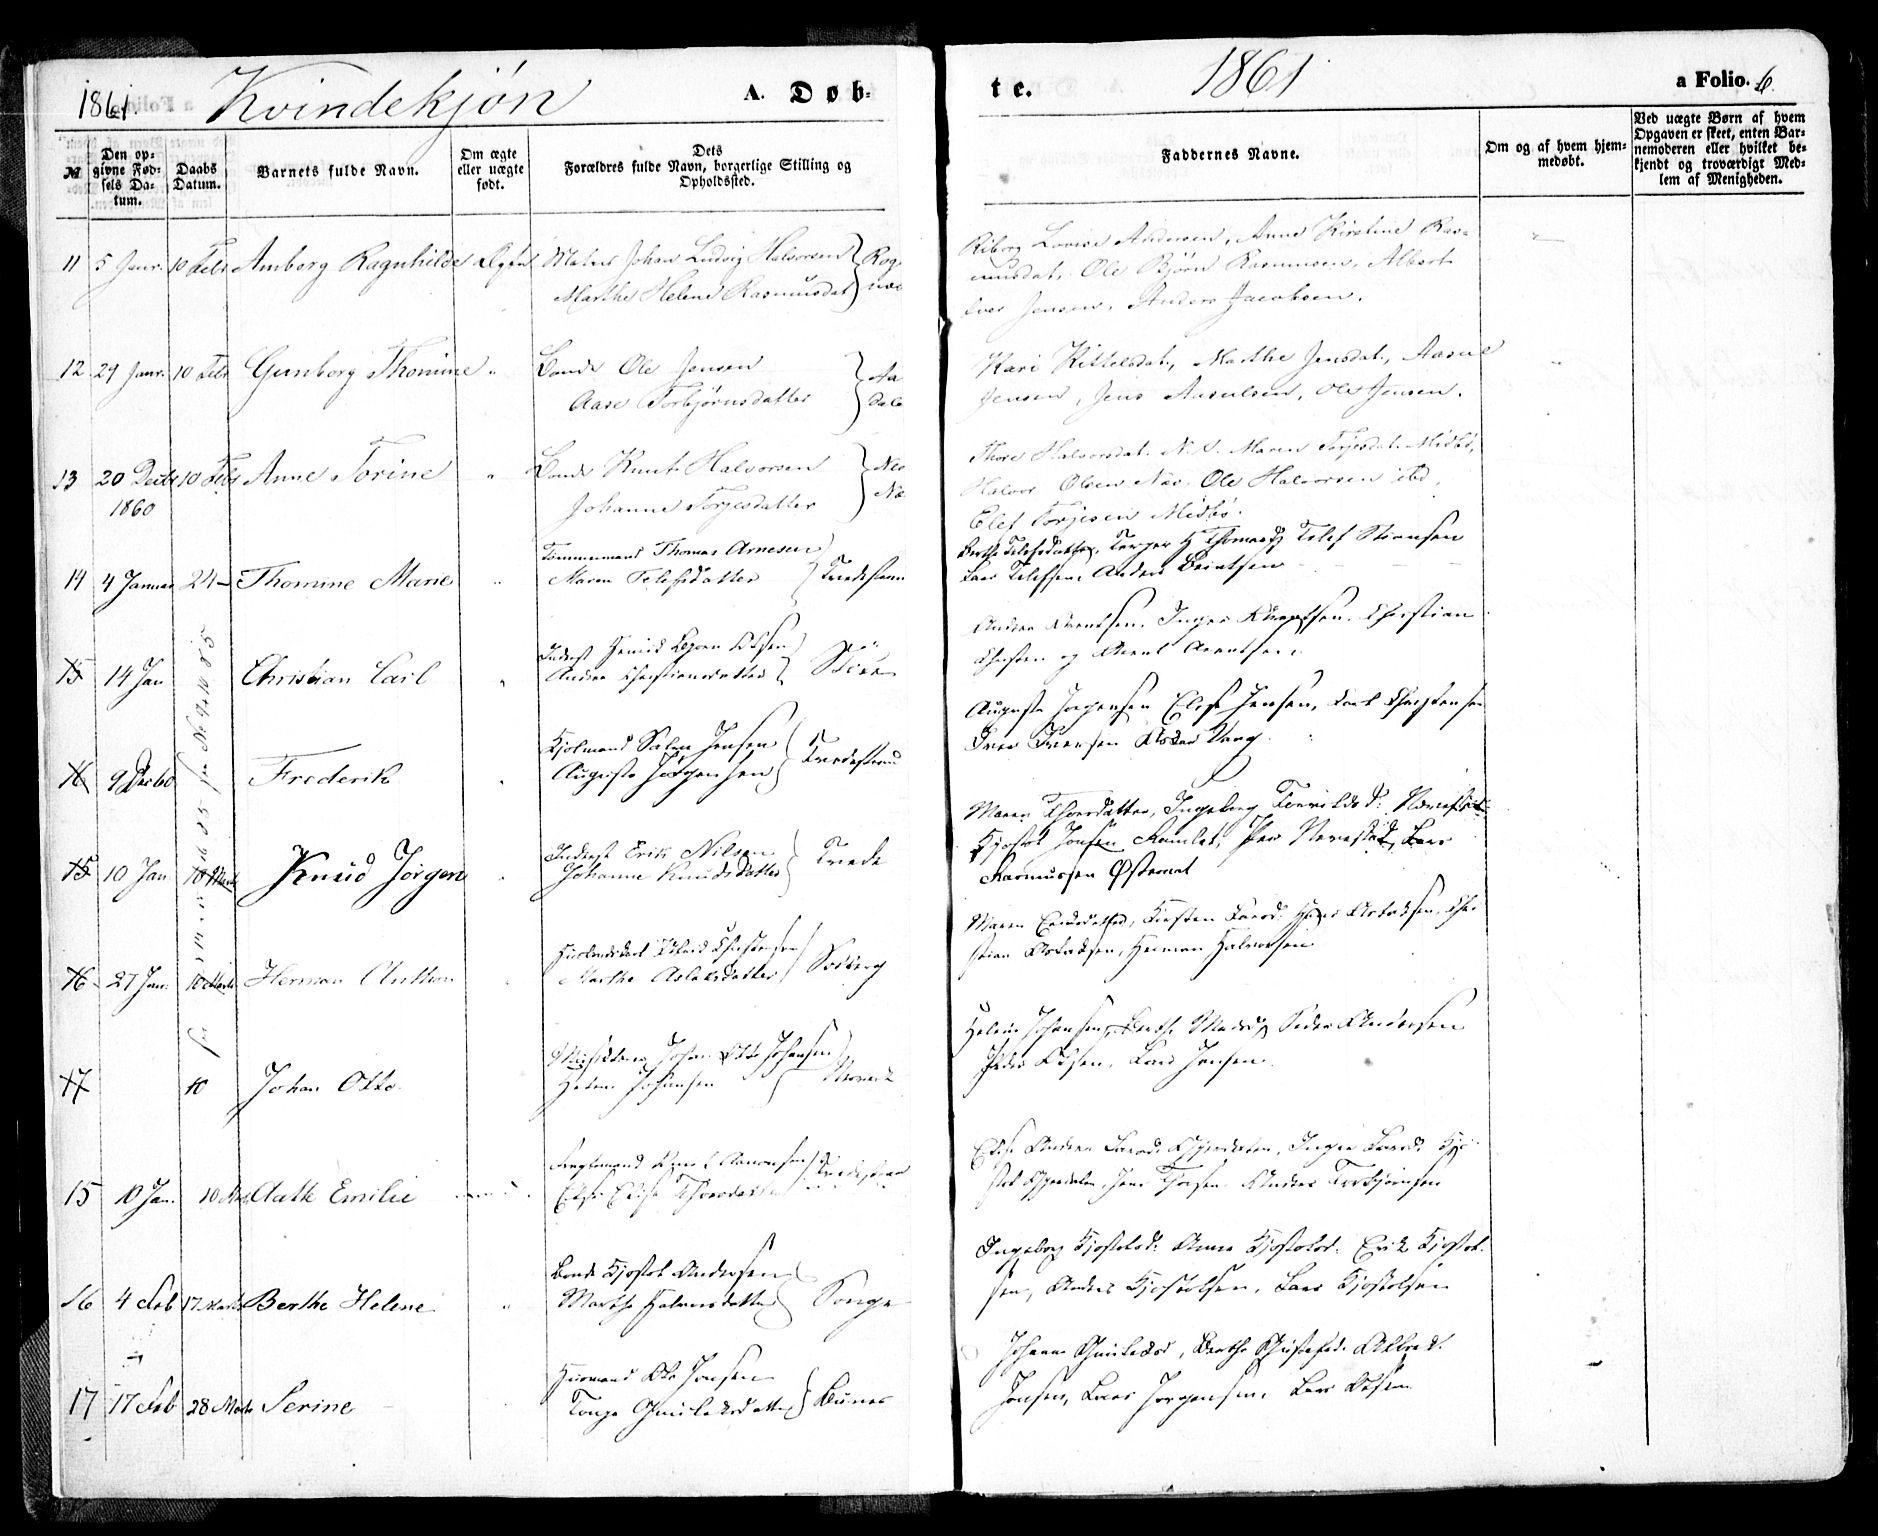 SAK, Holt sokneprestkontor, F/Fa/L0009: Ministerialbok nr. A 9, 1861-1871, s. 6